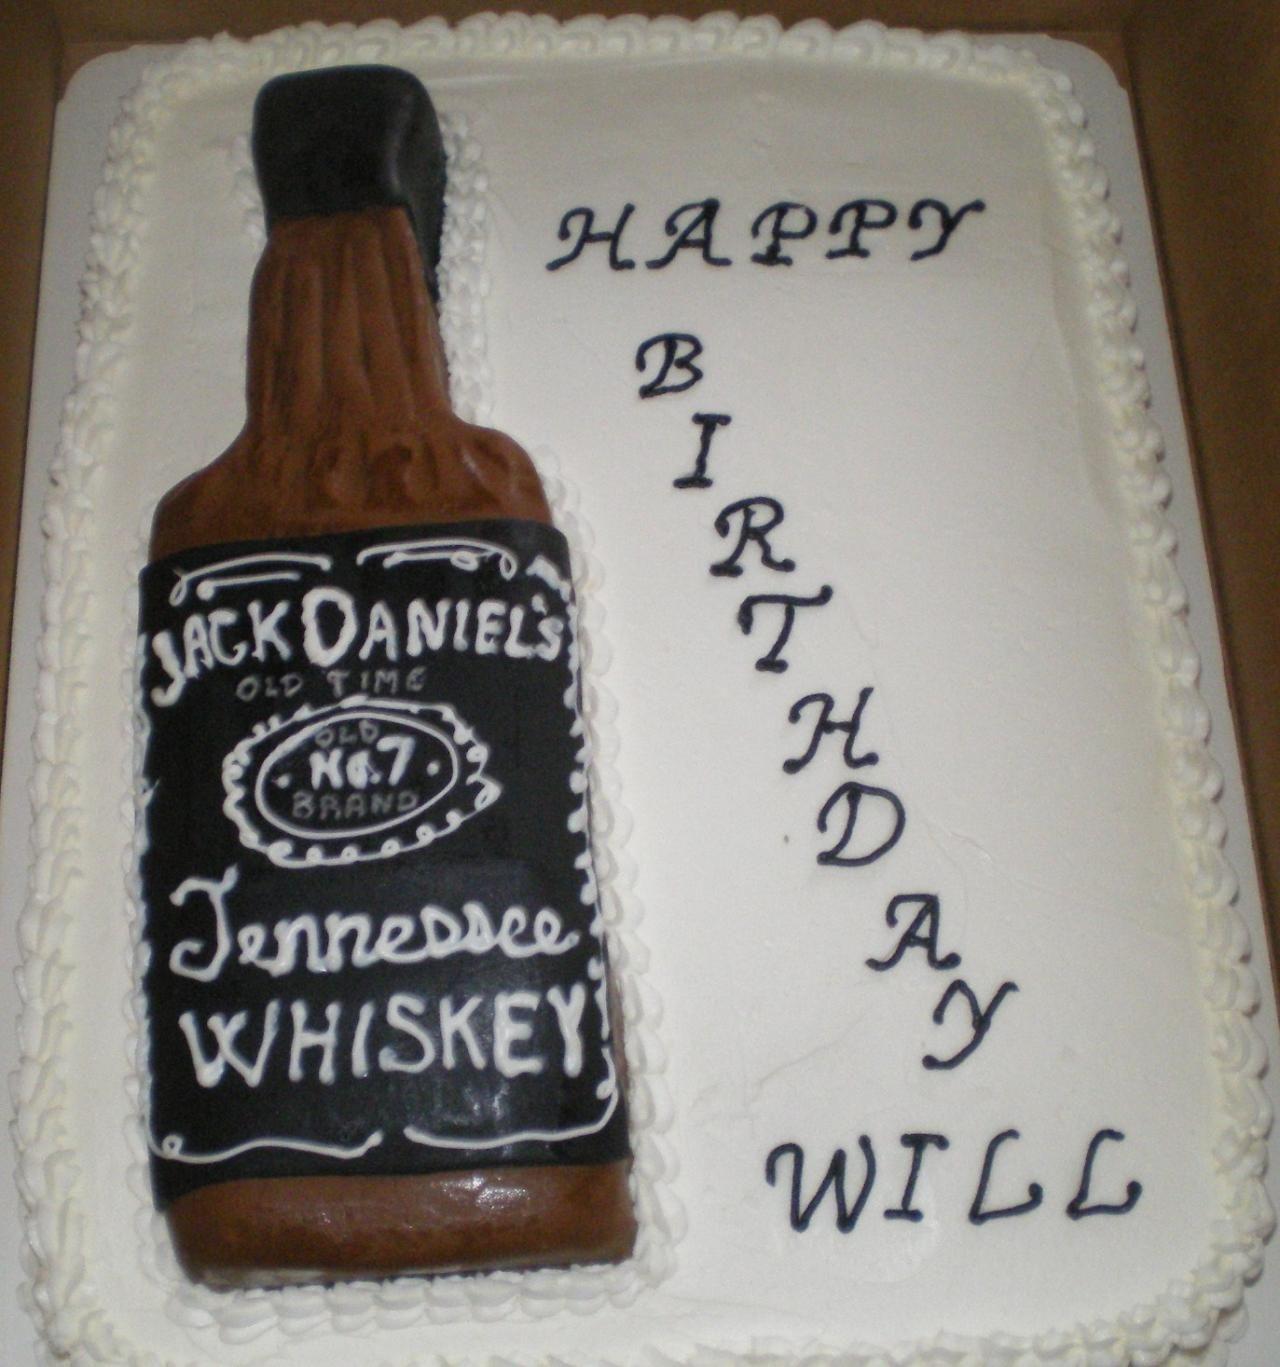 Jack Daniels Cake Cakes Pinterest Cake Jack daniels and